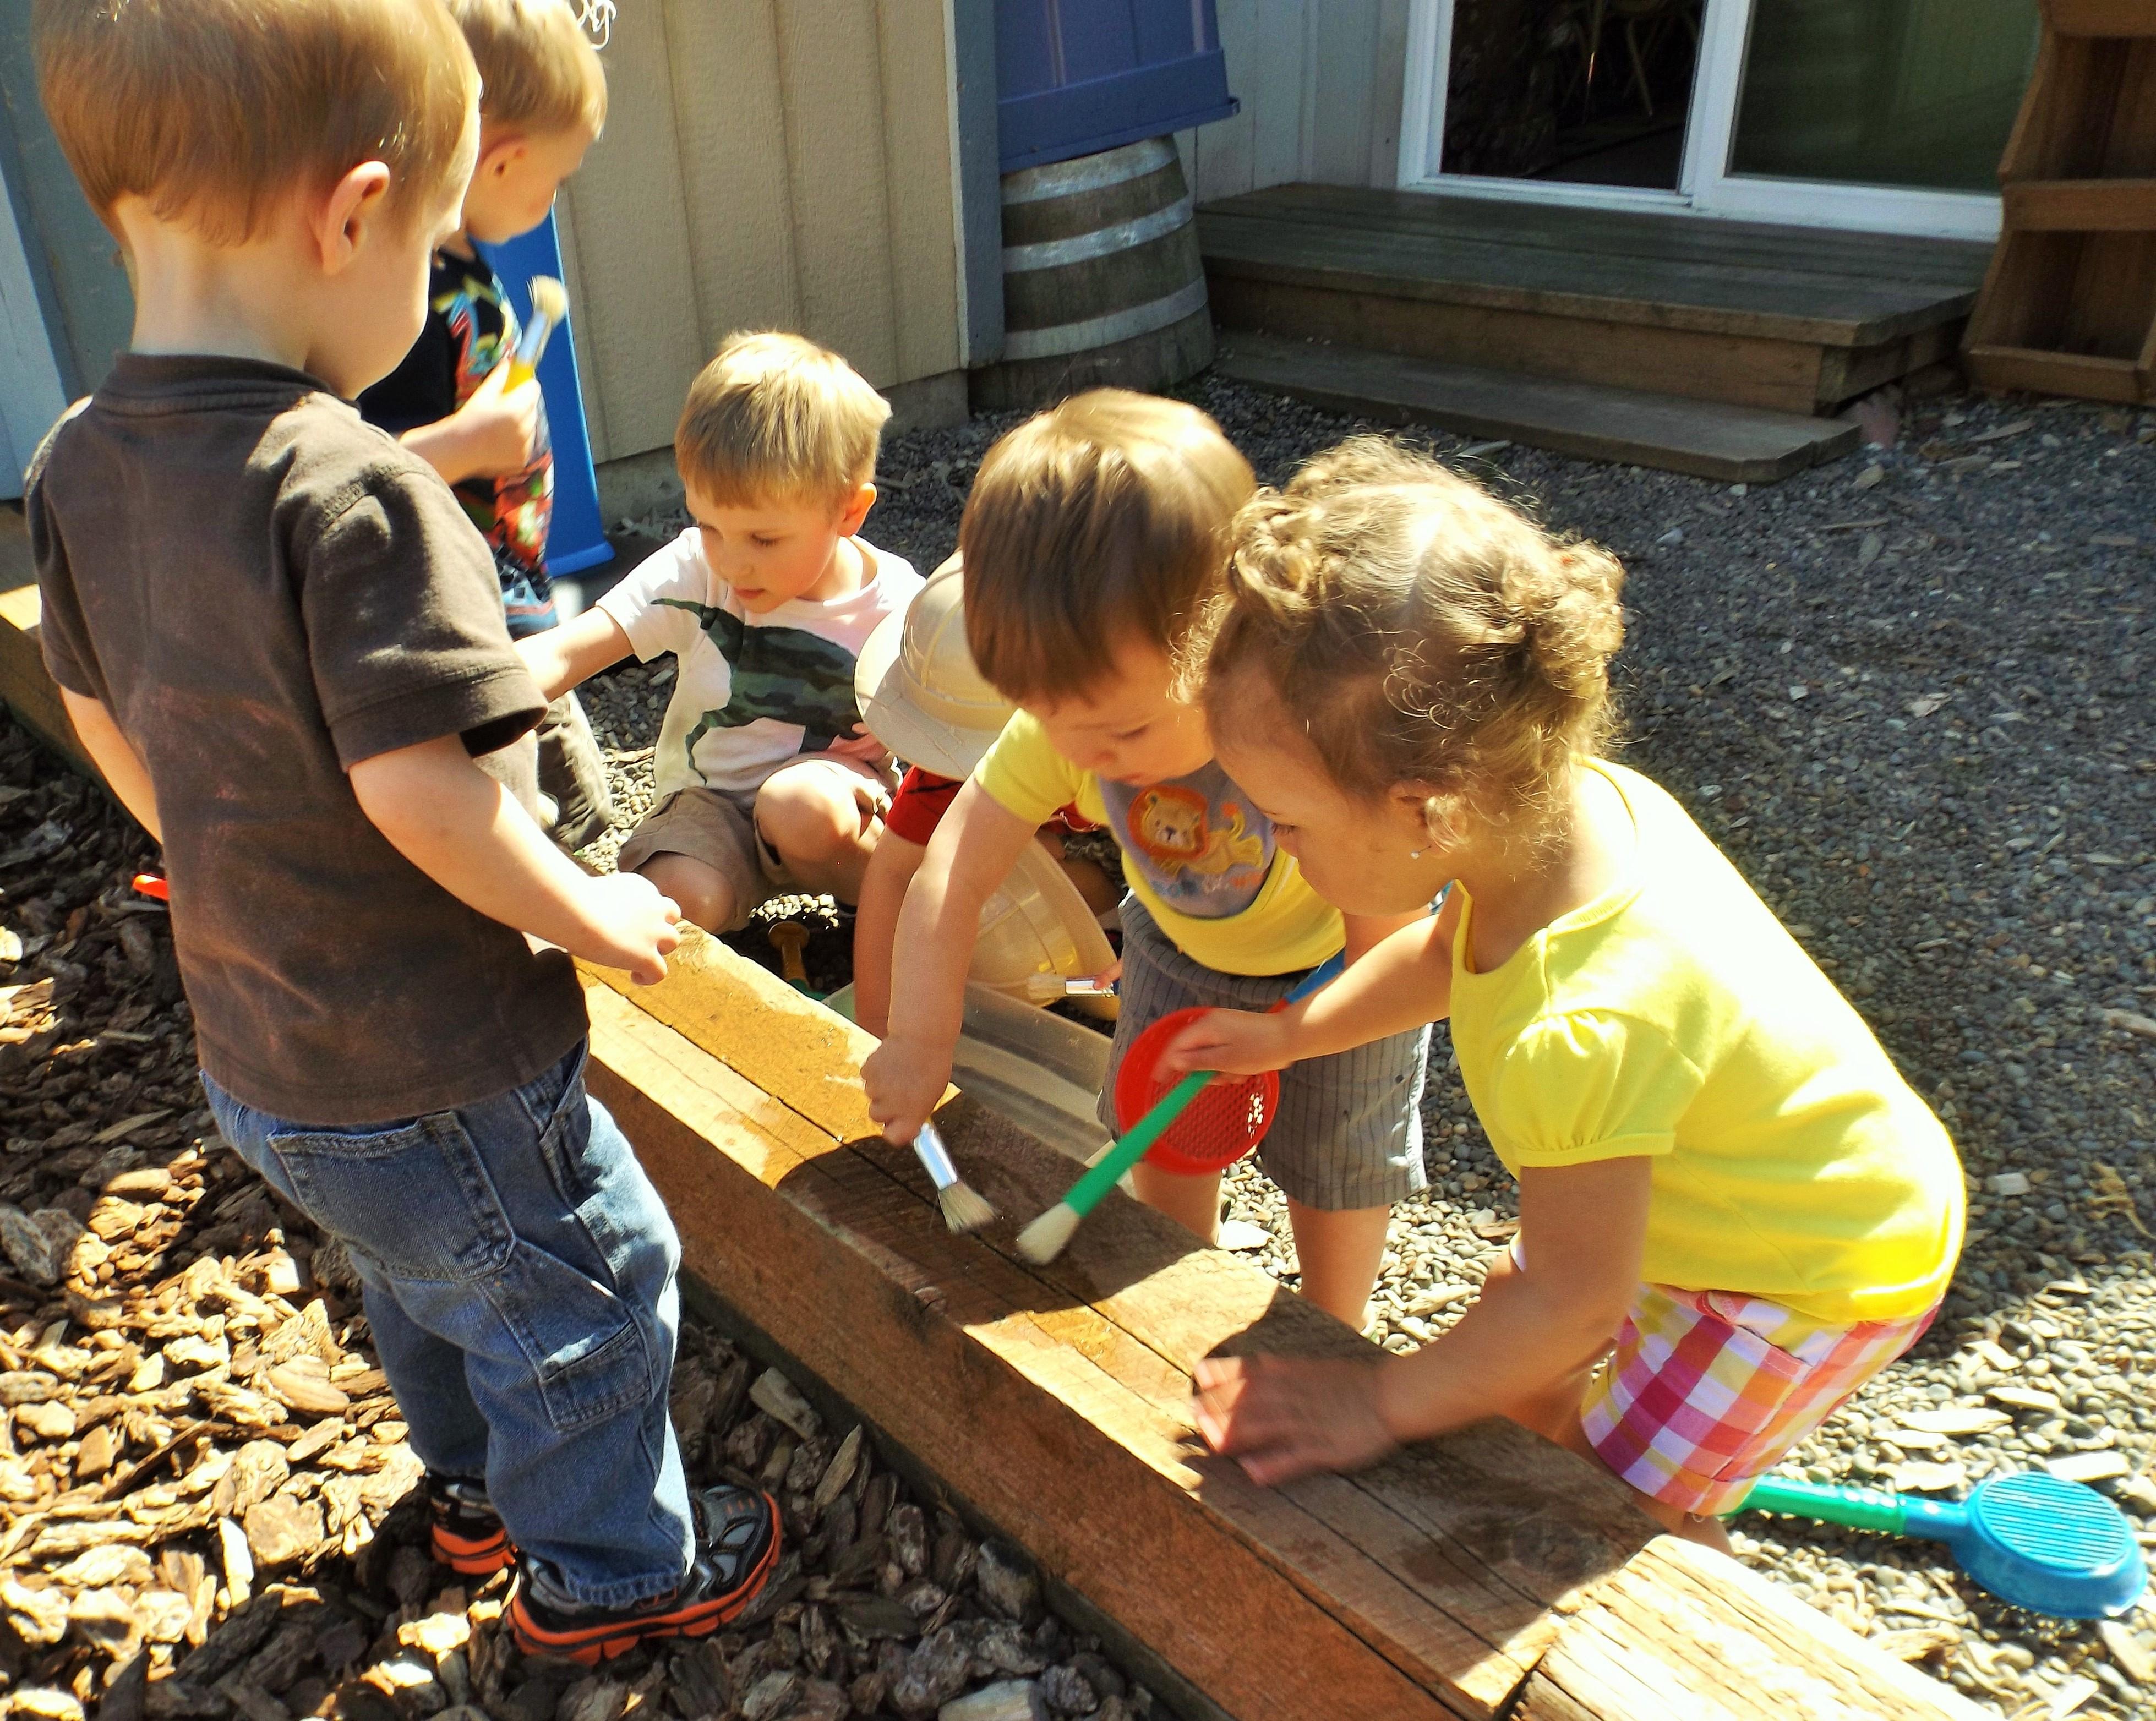 lakewood preschool tendercare childcare amp preschool lakewood carelulu 488